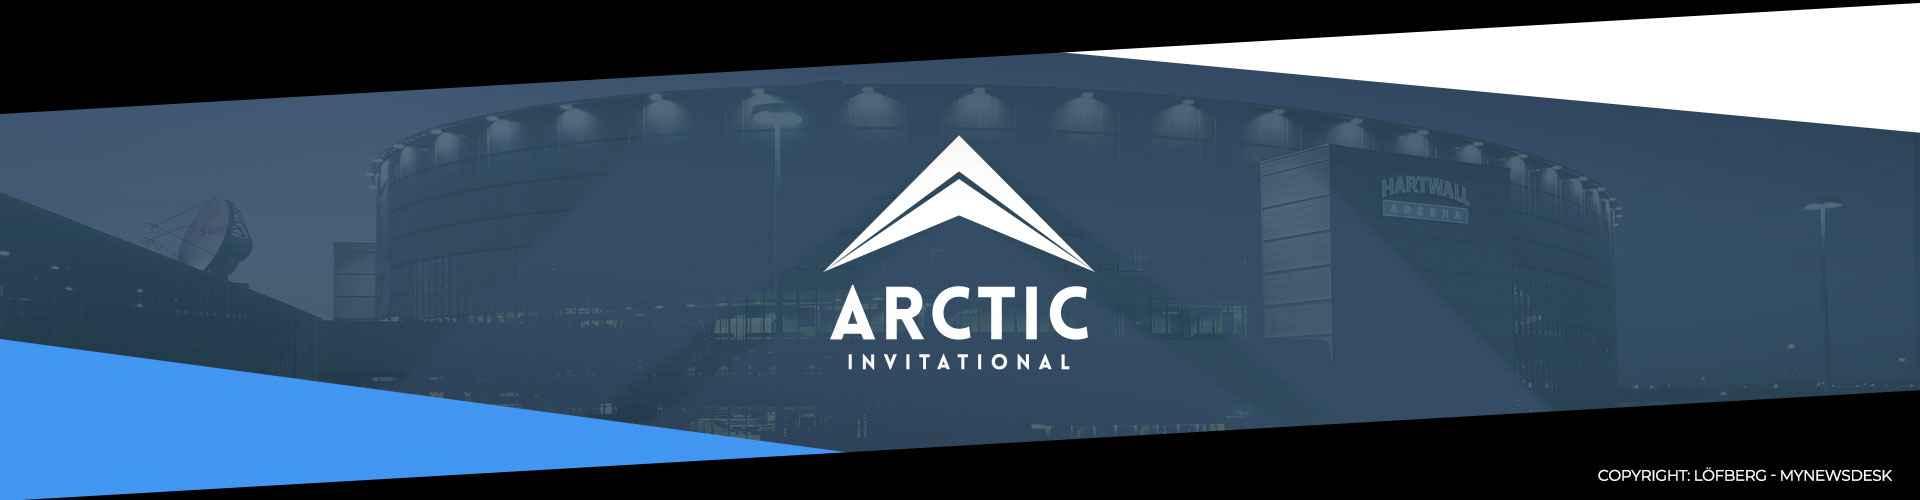 FURIA Esports står som mästare i Arctic Invitational 2019!